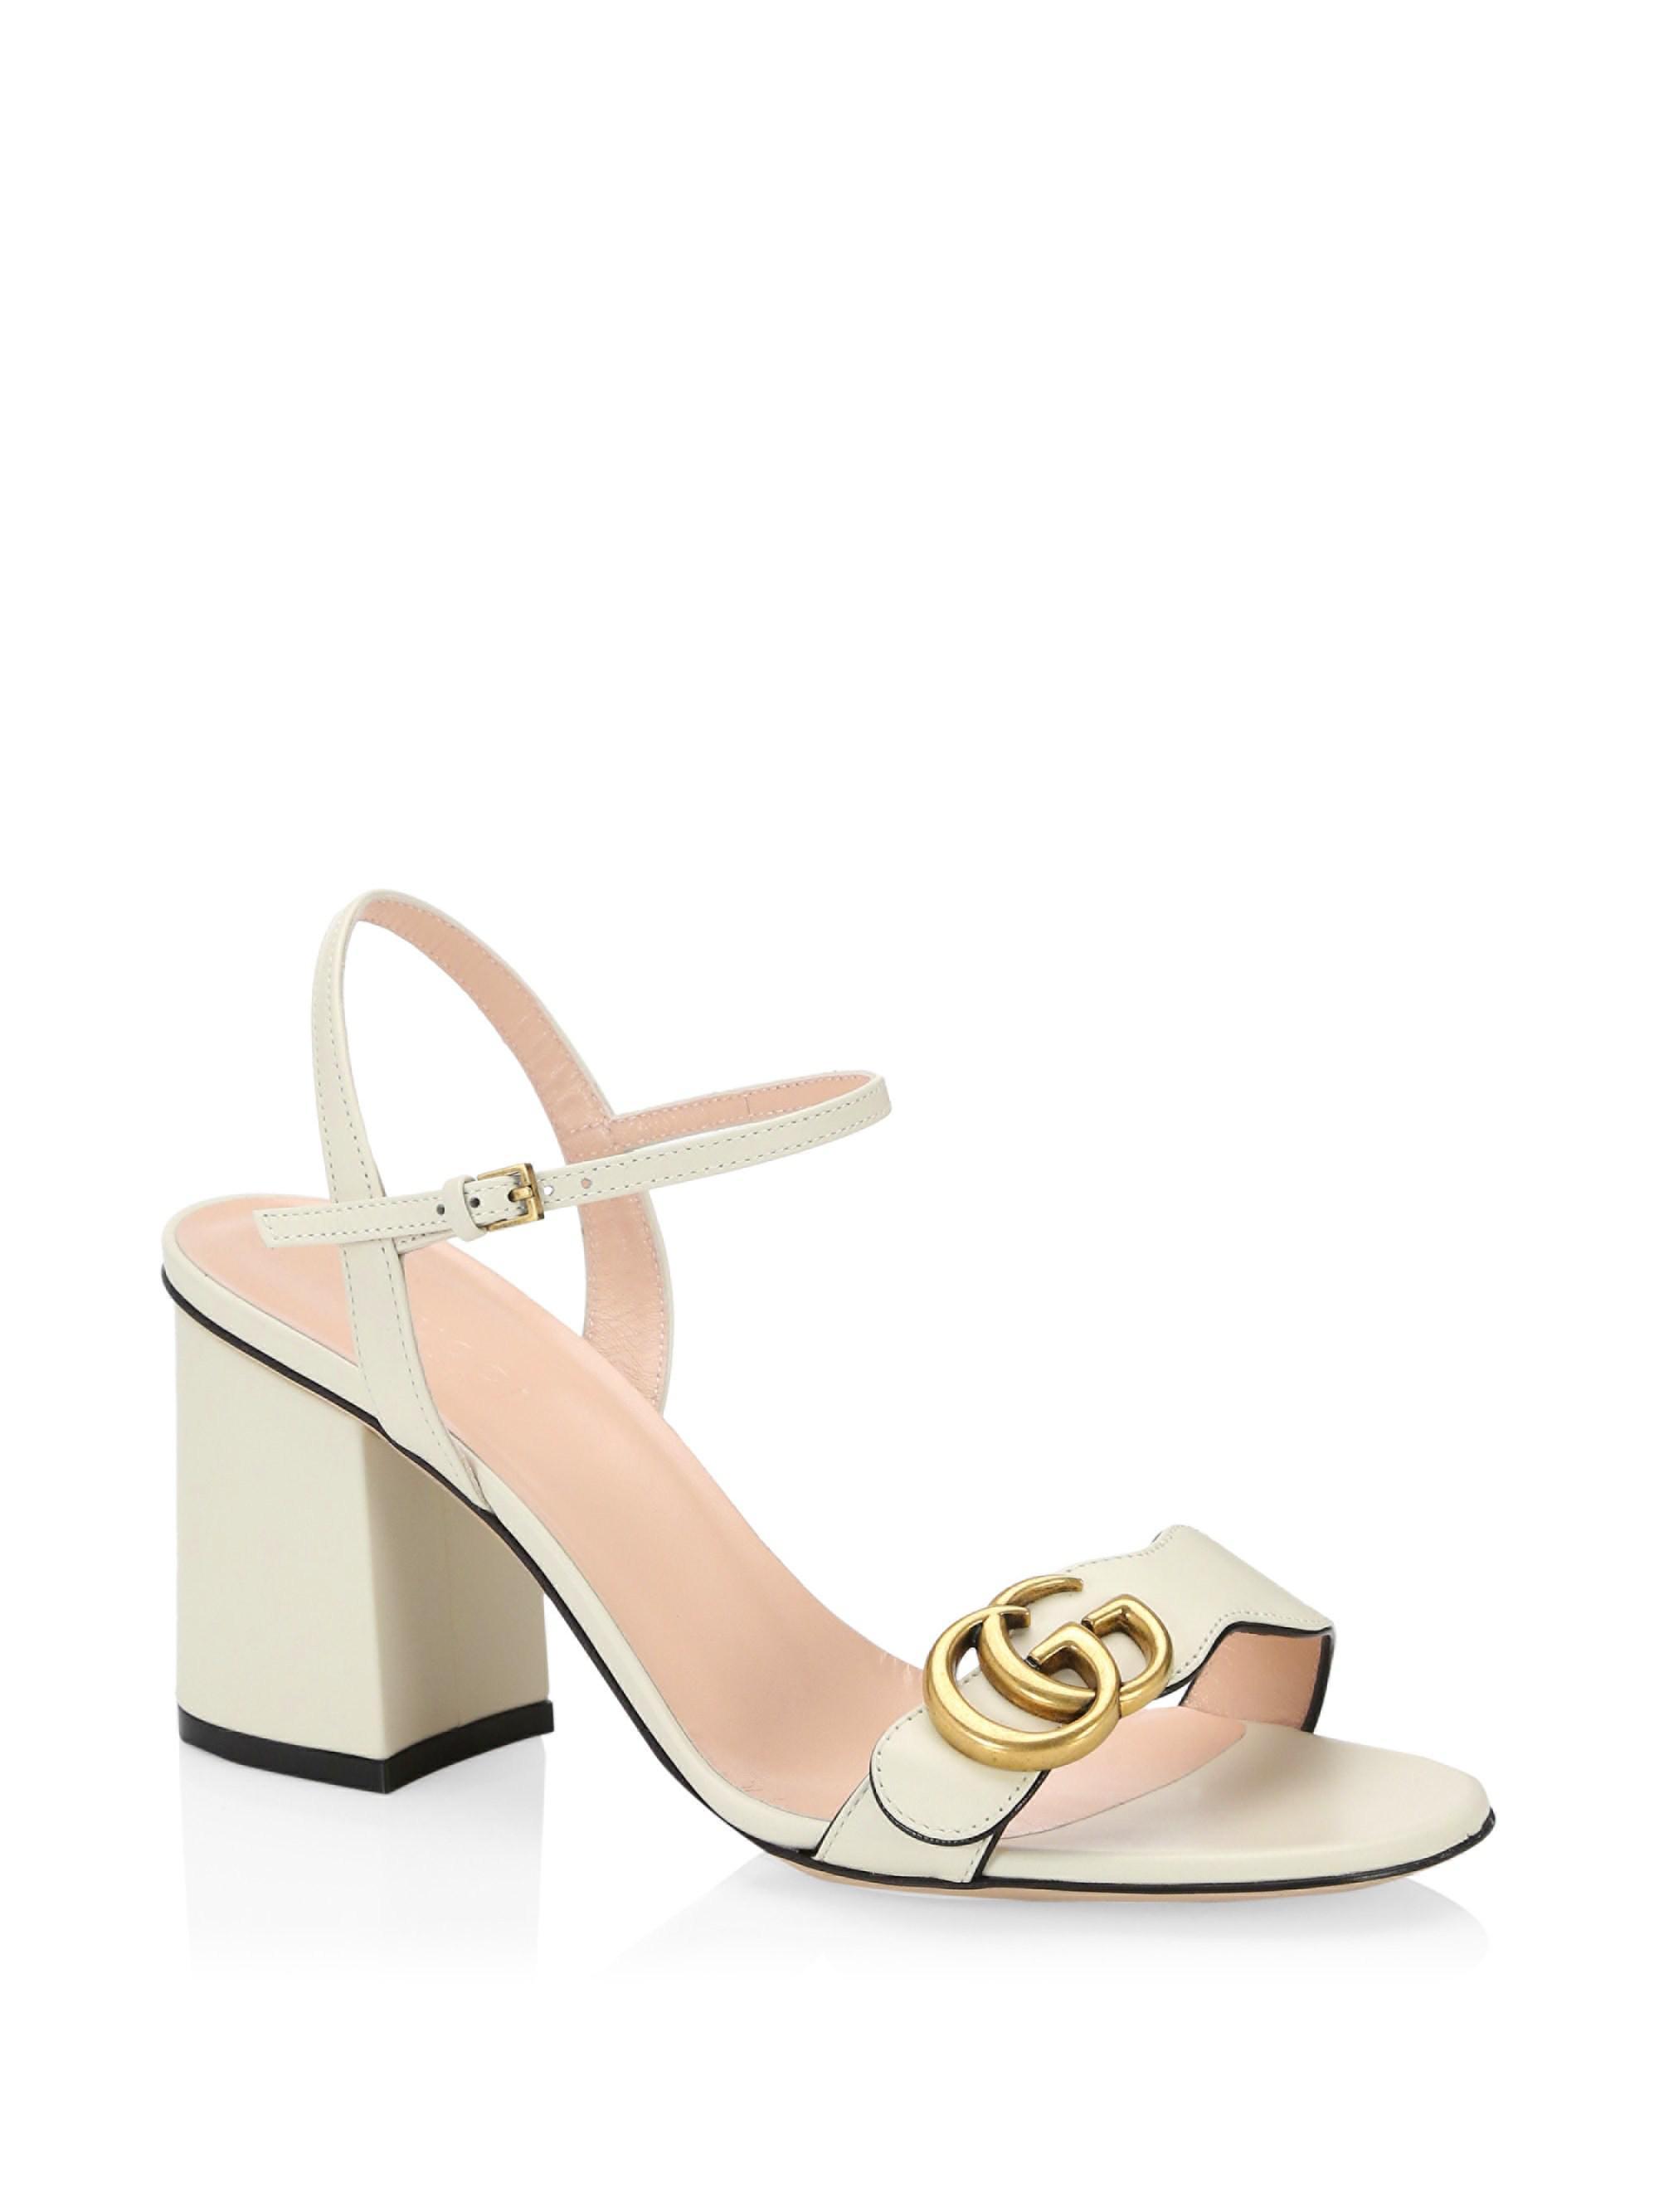 3b9e92ca963 Gucci. Women s Marmont GG Ankle-strap Sandals